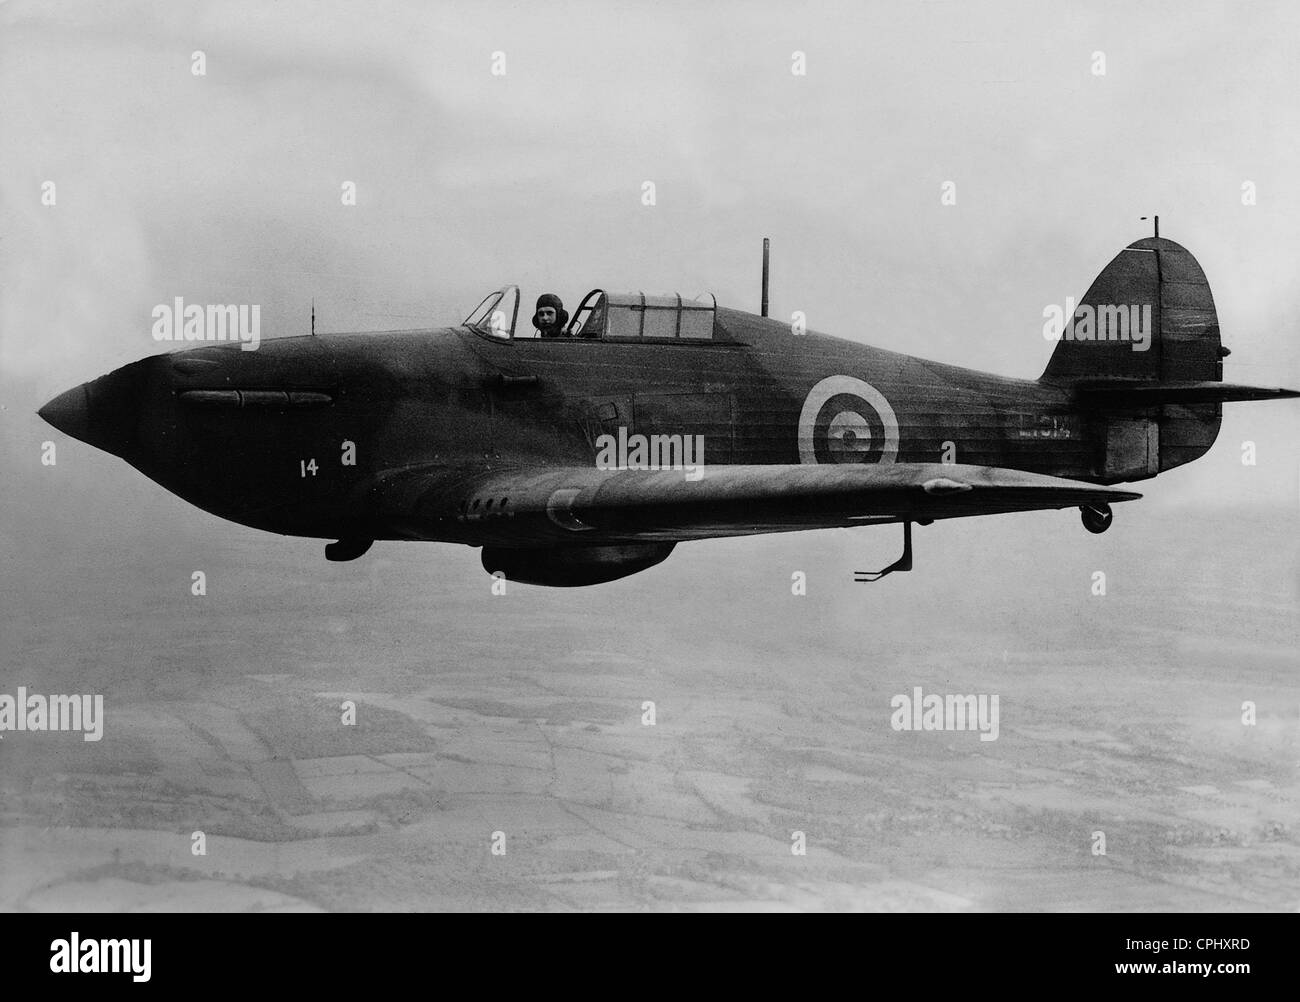 British Hawker 'Hurricane' Fighter Plane, 1938 - Stock Image